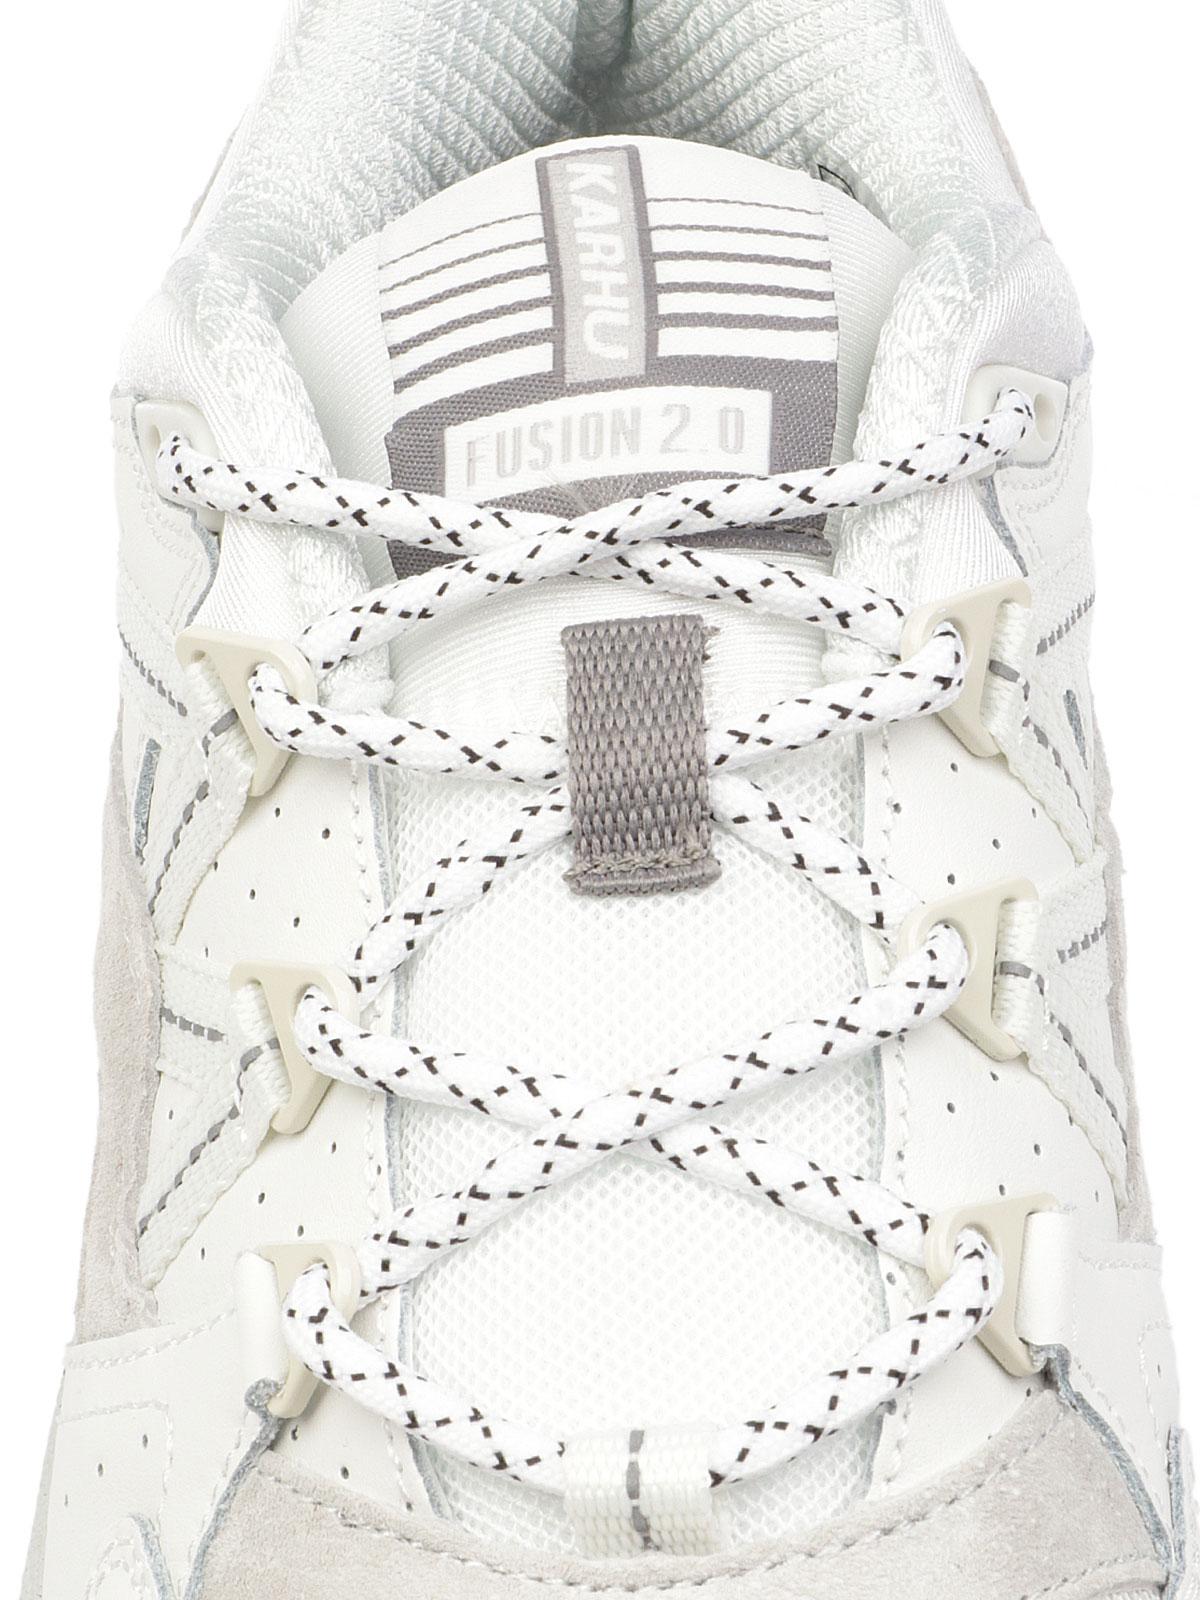 Immagine di KARHU   Sneaker Donna Fusion 2.0